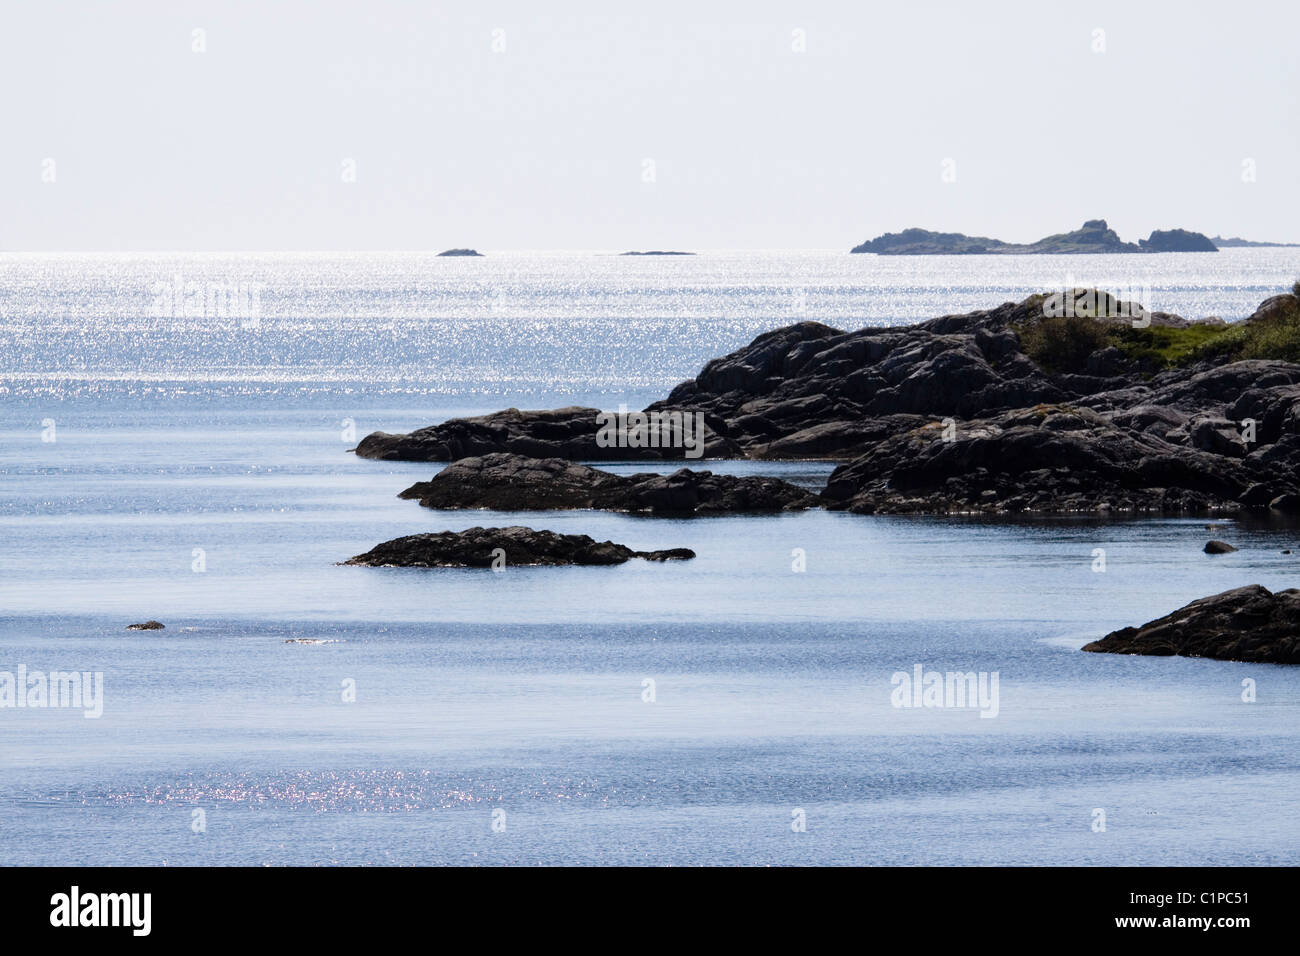 Scotland, Moidart, Sound of Arisaig, rocky coastline - Stock Image